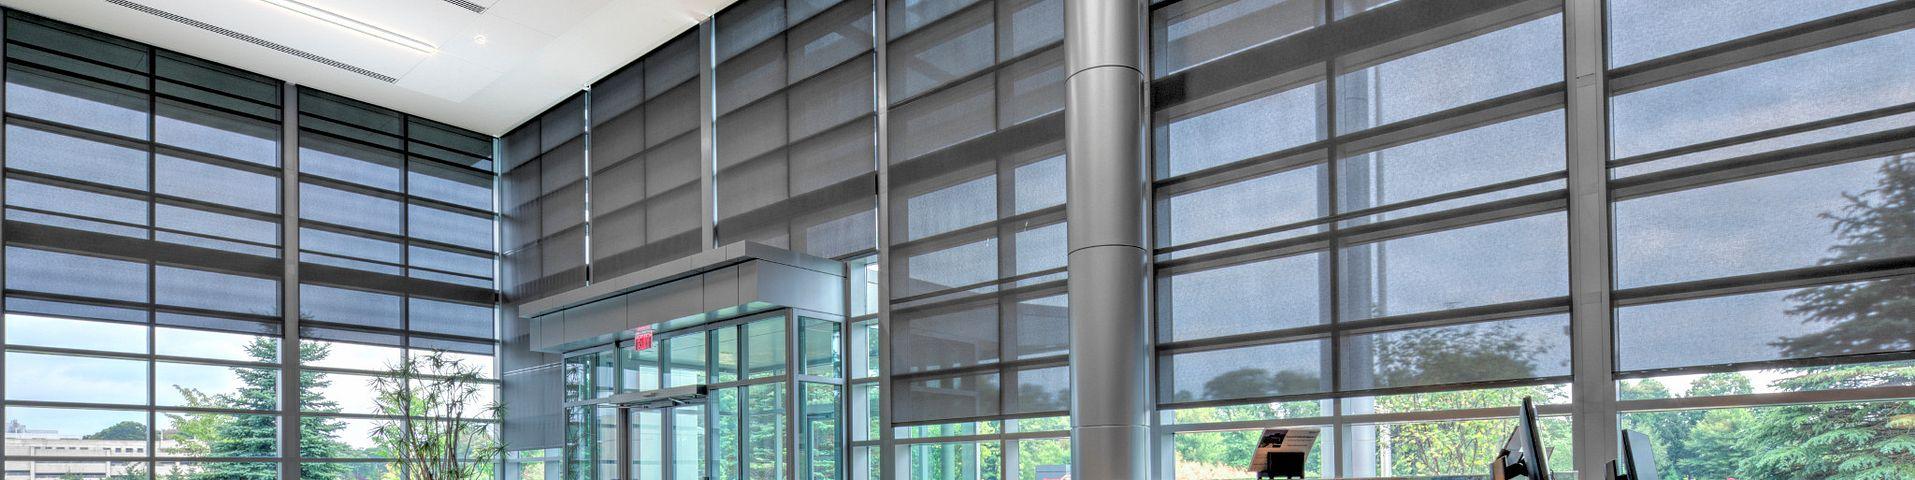 General Contractor Solutions